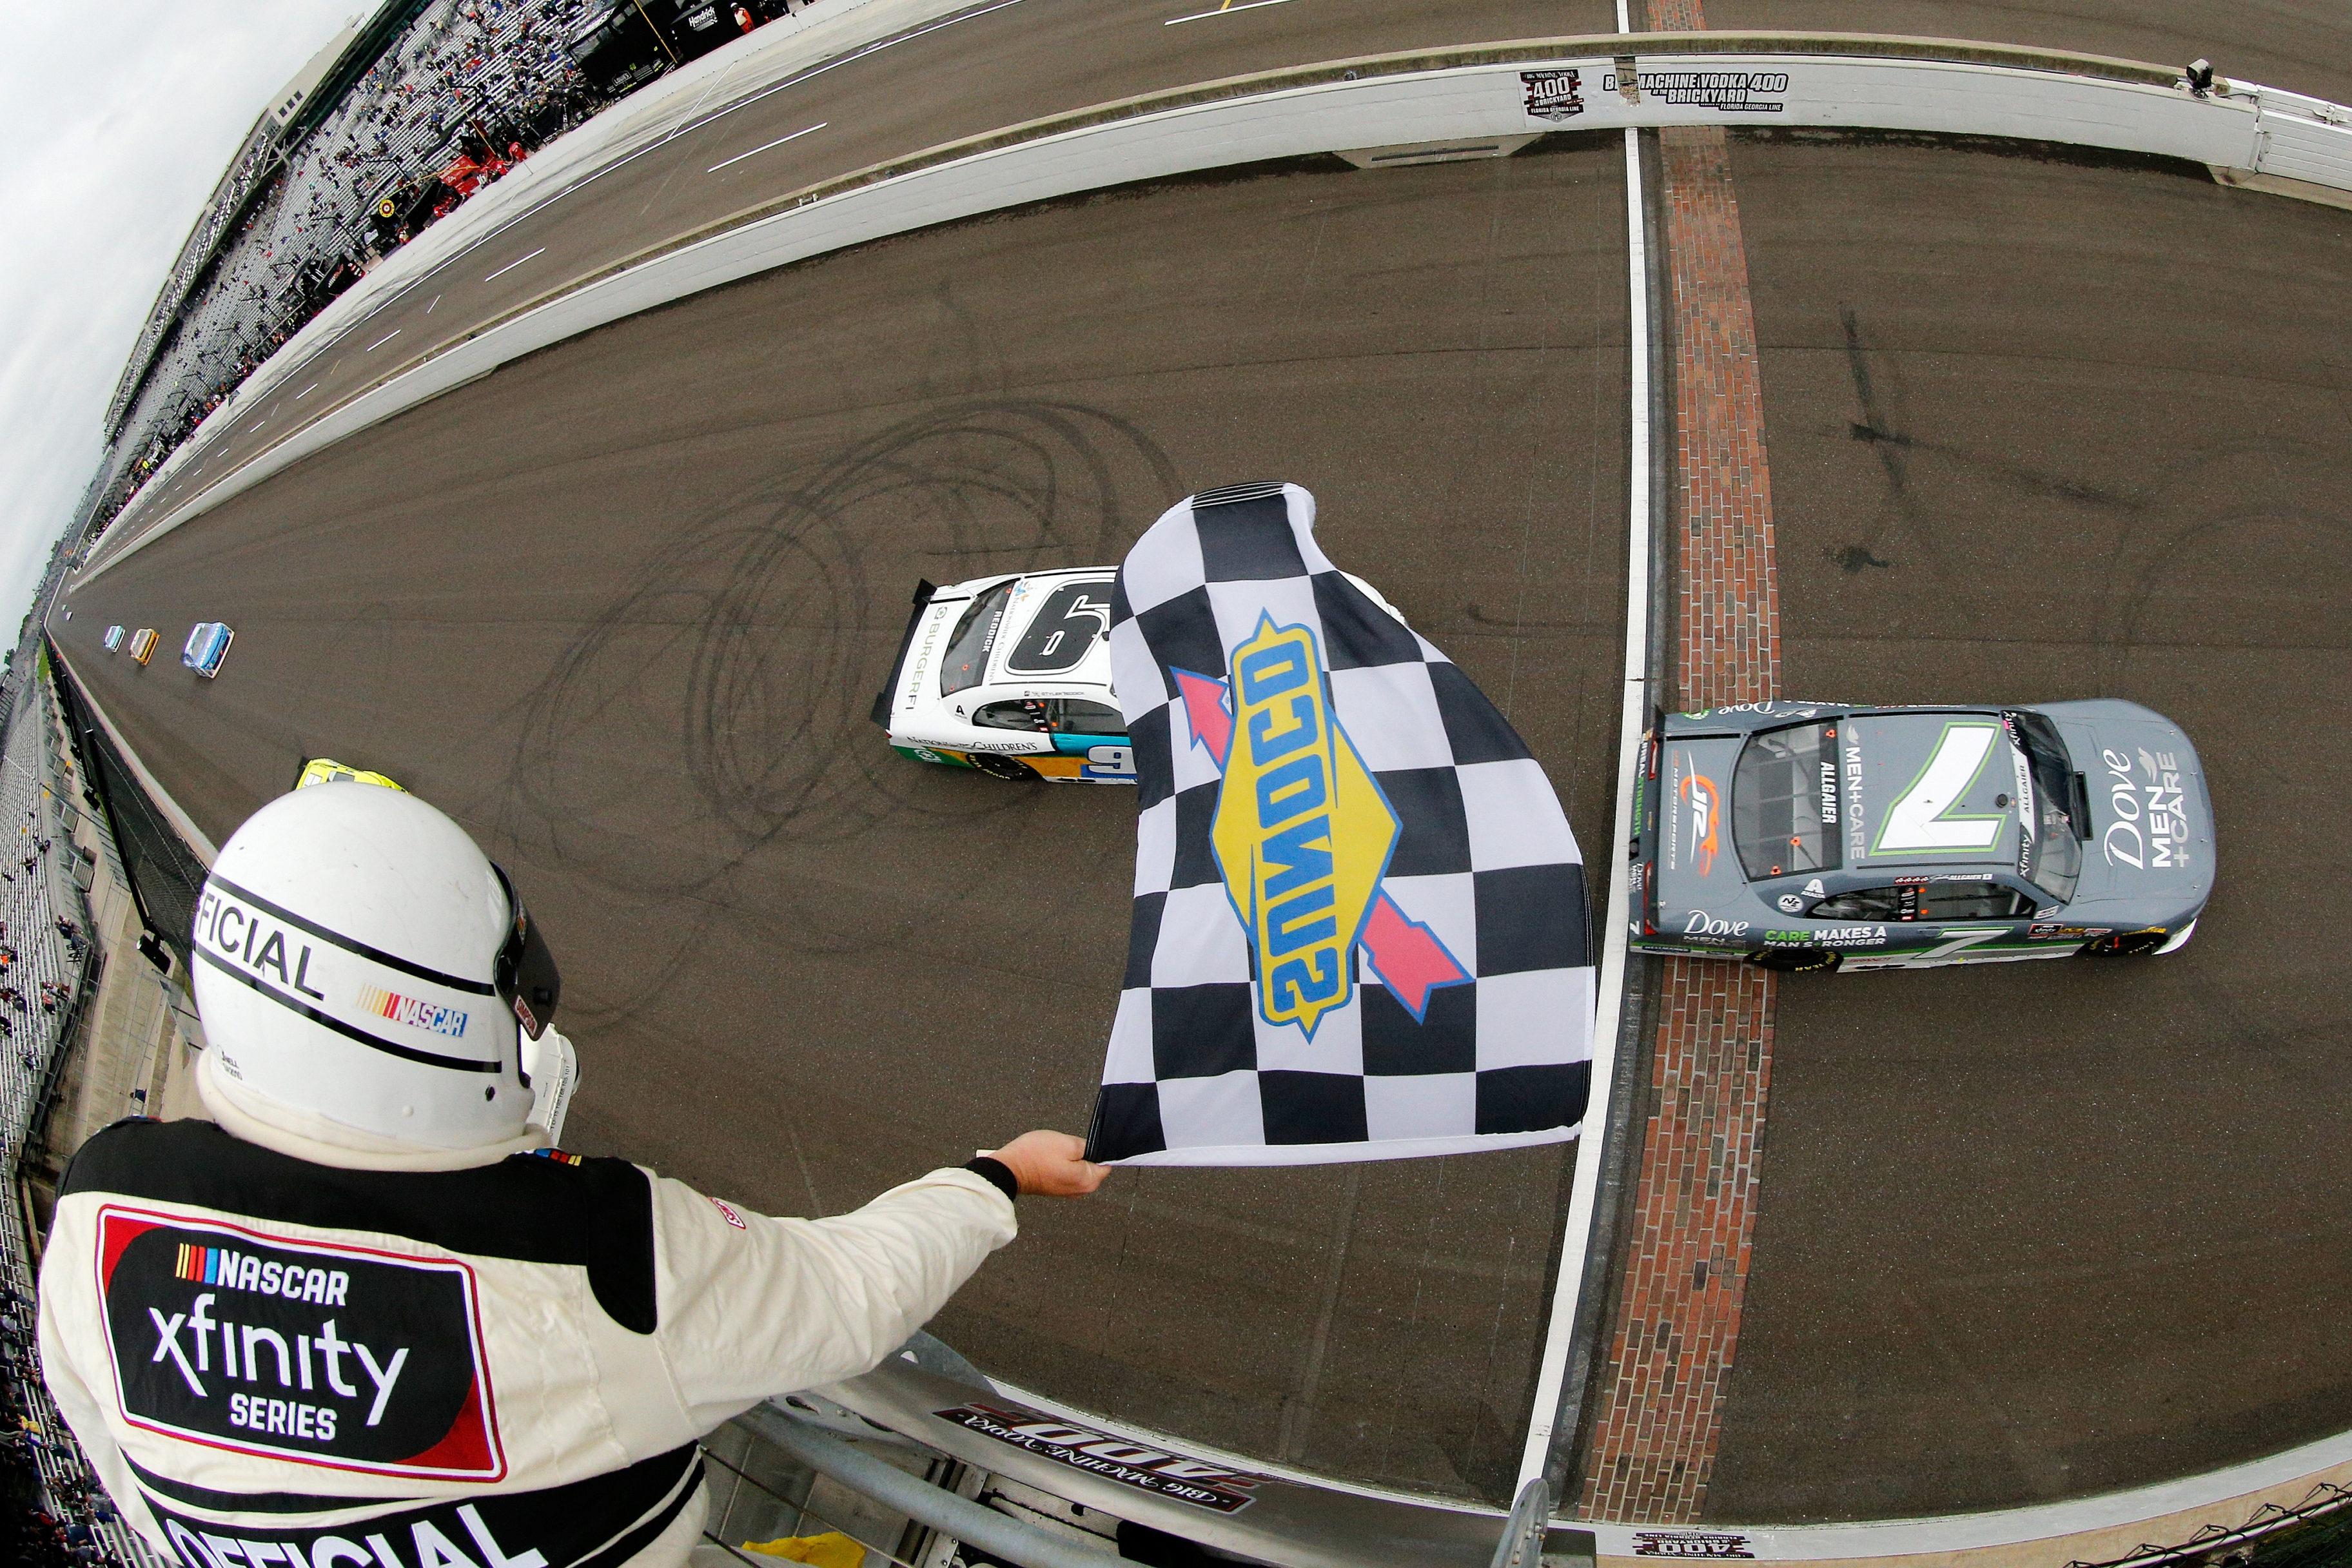 Justin Allgaier wins at Indianapolis Motor Speedway